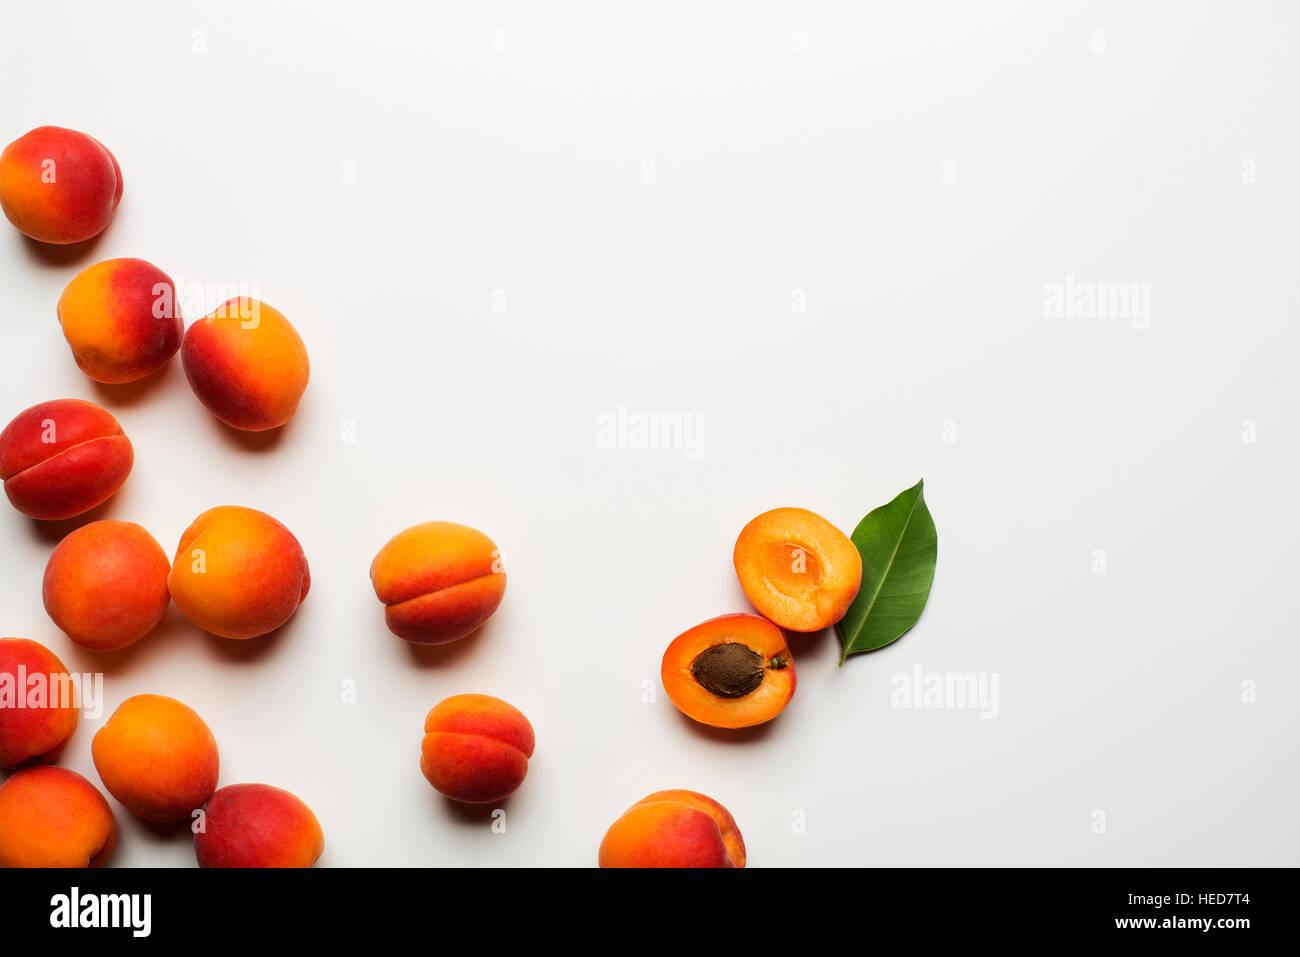 Fresh cut apricot fruits on white background - Stock Image